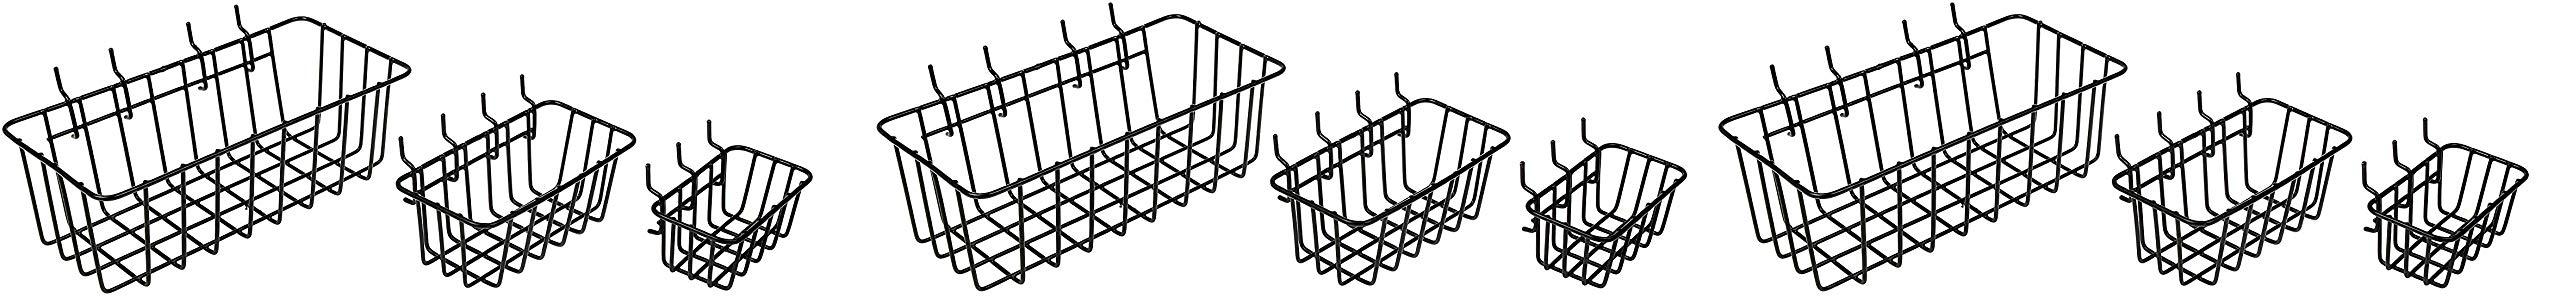 Dorman Hardware 4-9845 Peggable Wire Basket Set (3 X Pack of 3) by Dorman Hardware (Image #1)